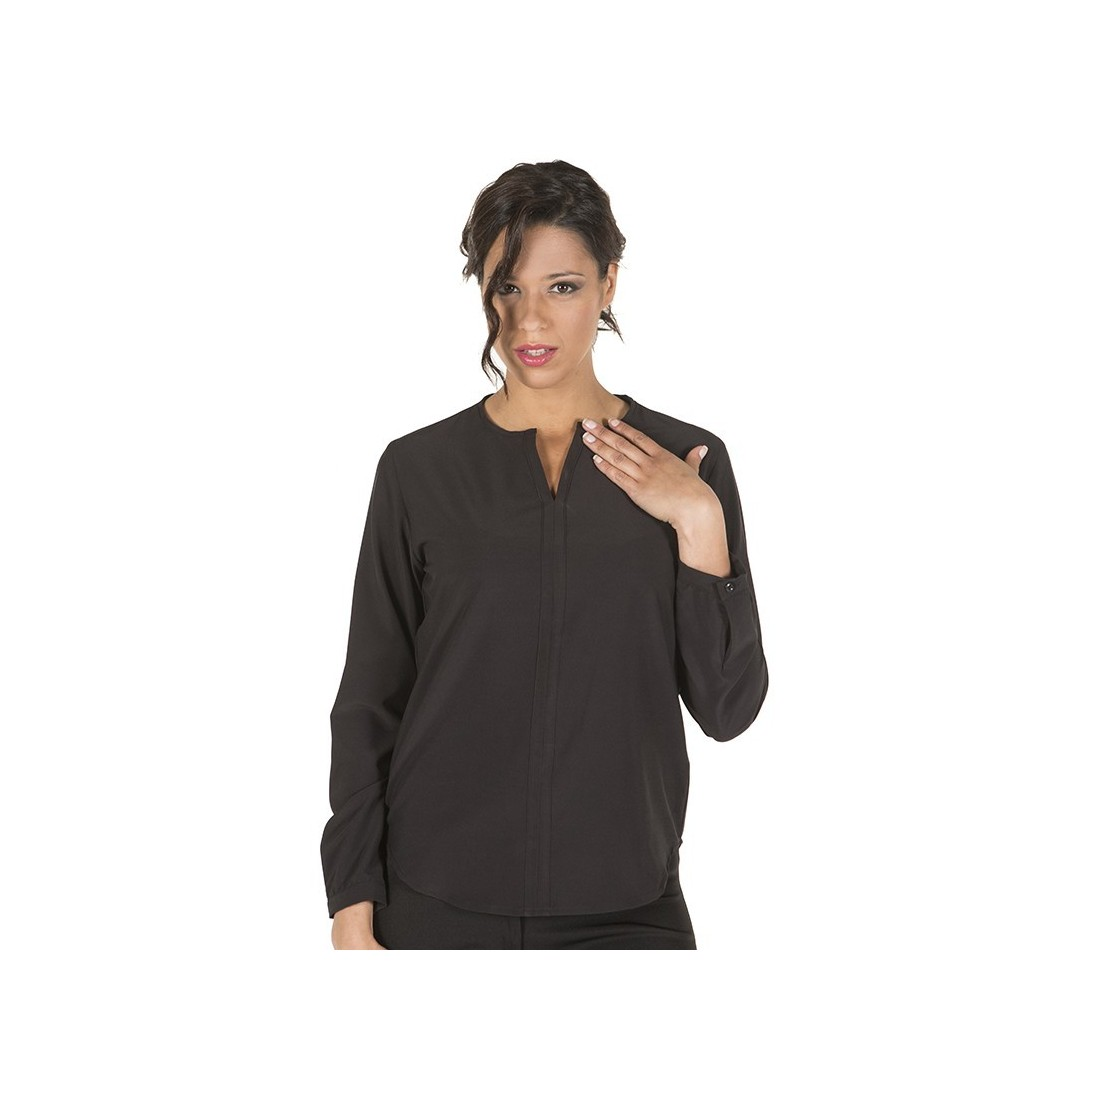 Blusa cerrada manga larga para mujer